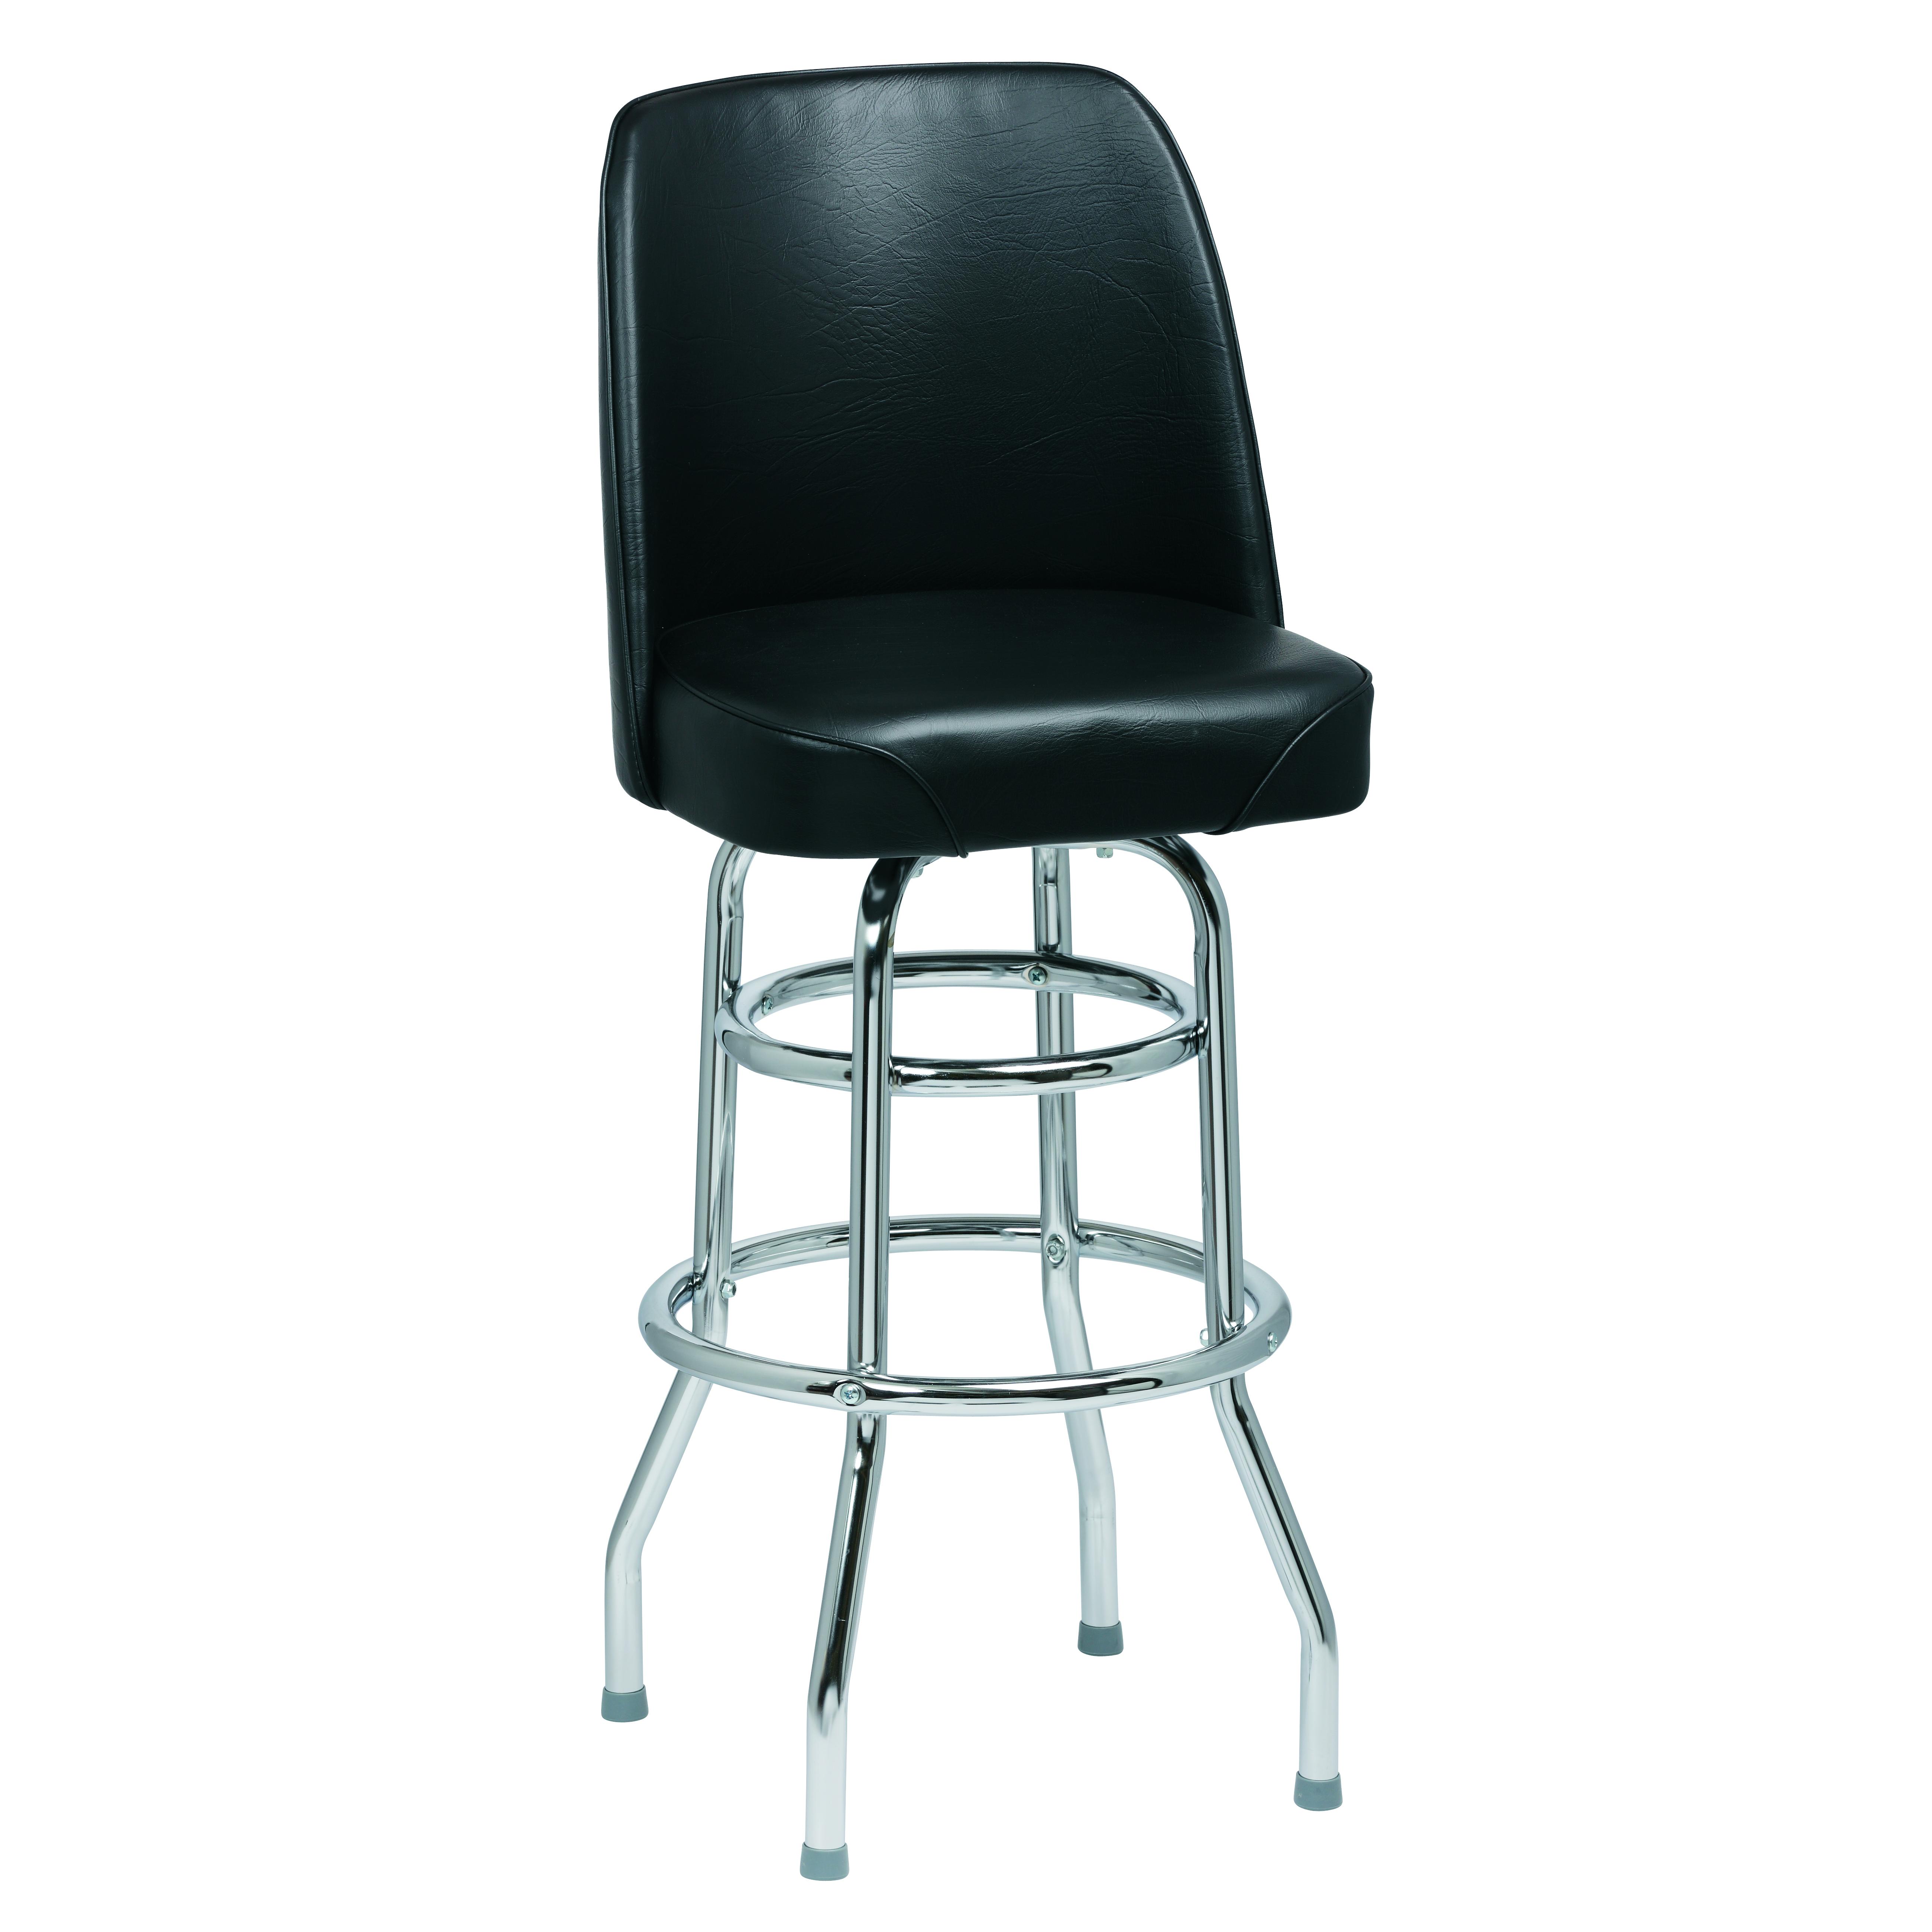 Royal Industries ROY 7722 B bar stool, swivel, indoor